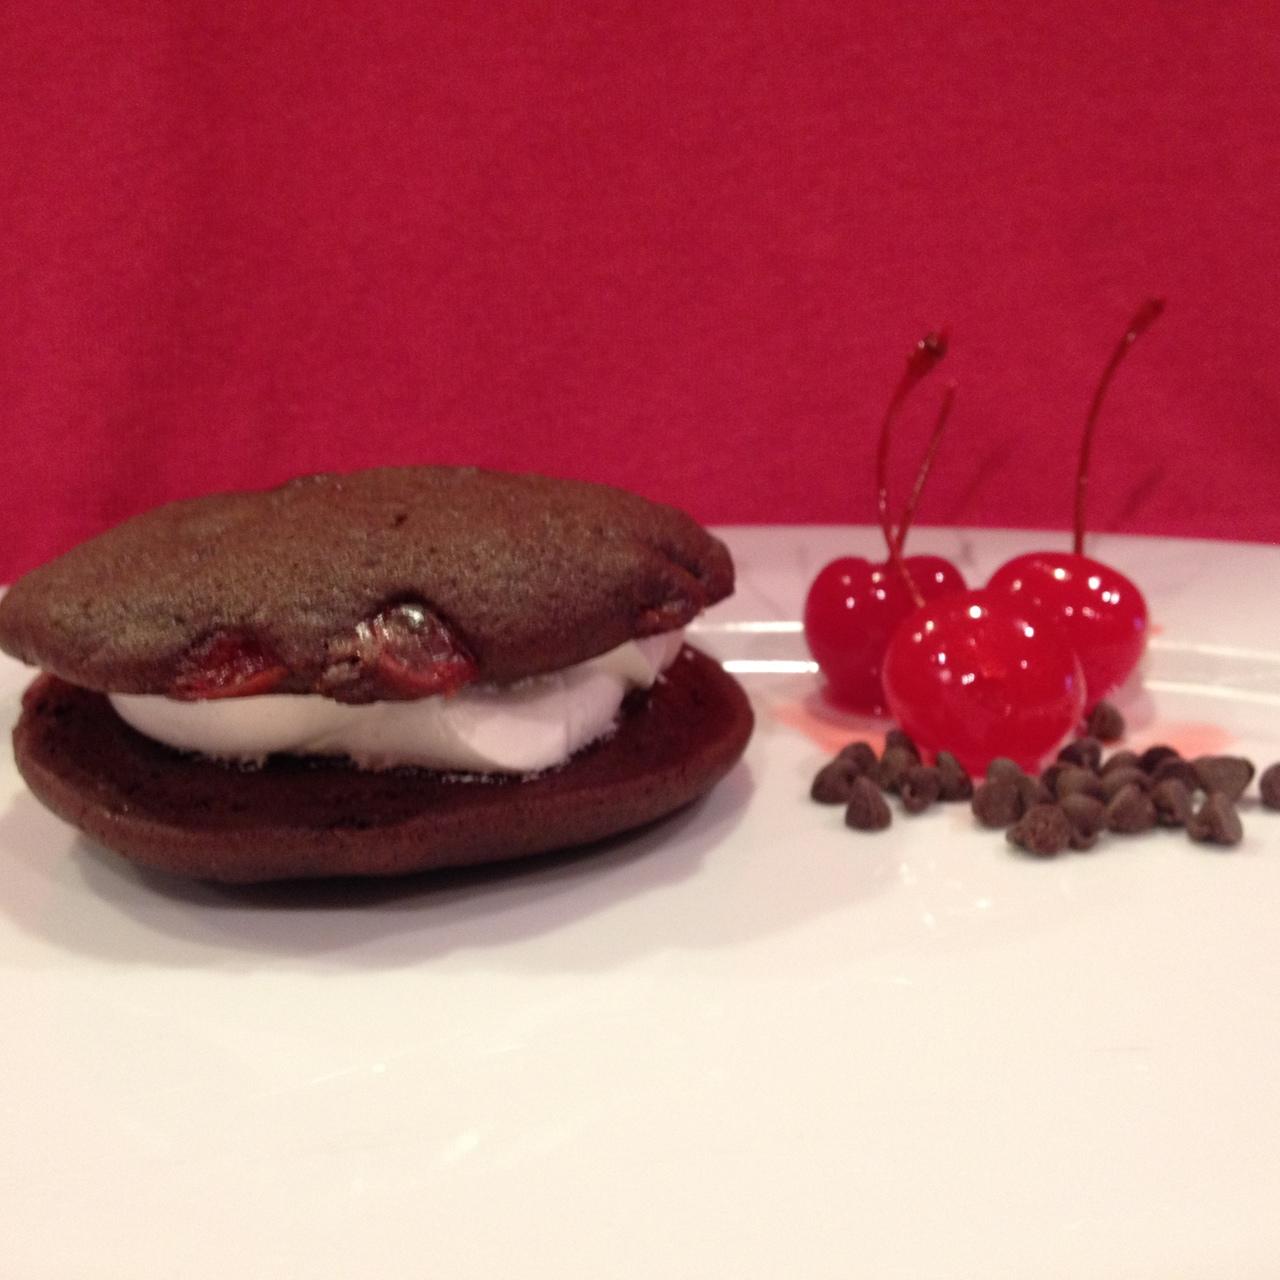 6 Pack- Large Chocolate Cherry Whoopie Pies